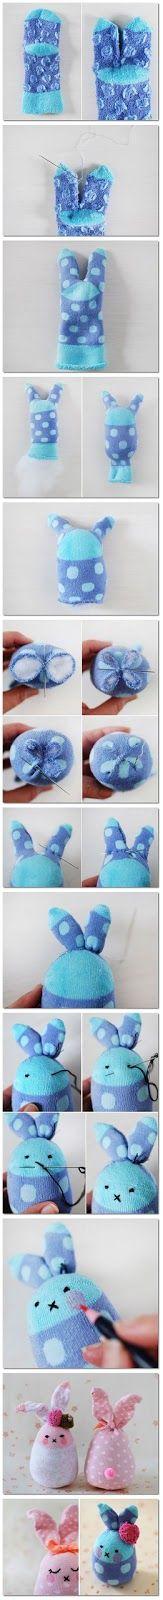 Step by step tutorial Instruction on How to Make Socks Bunny DIY | Fun Hug